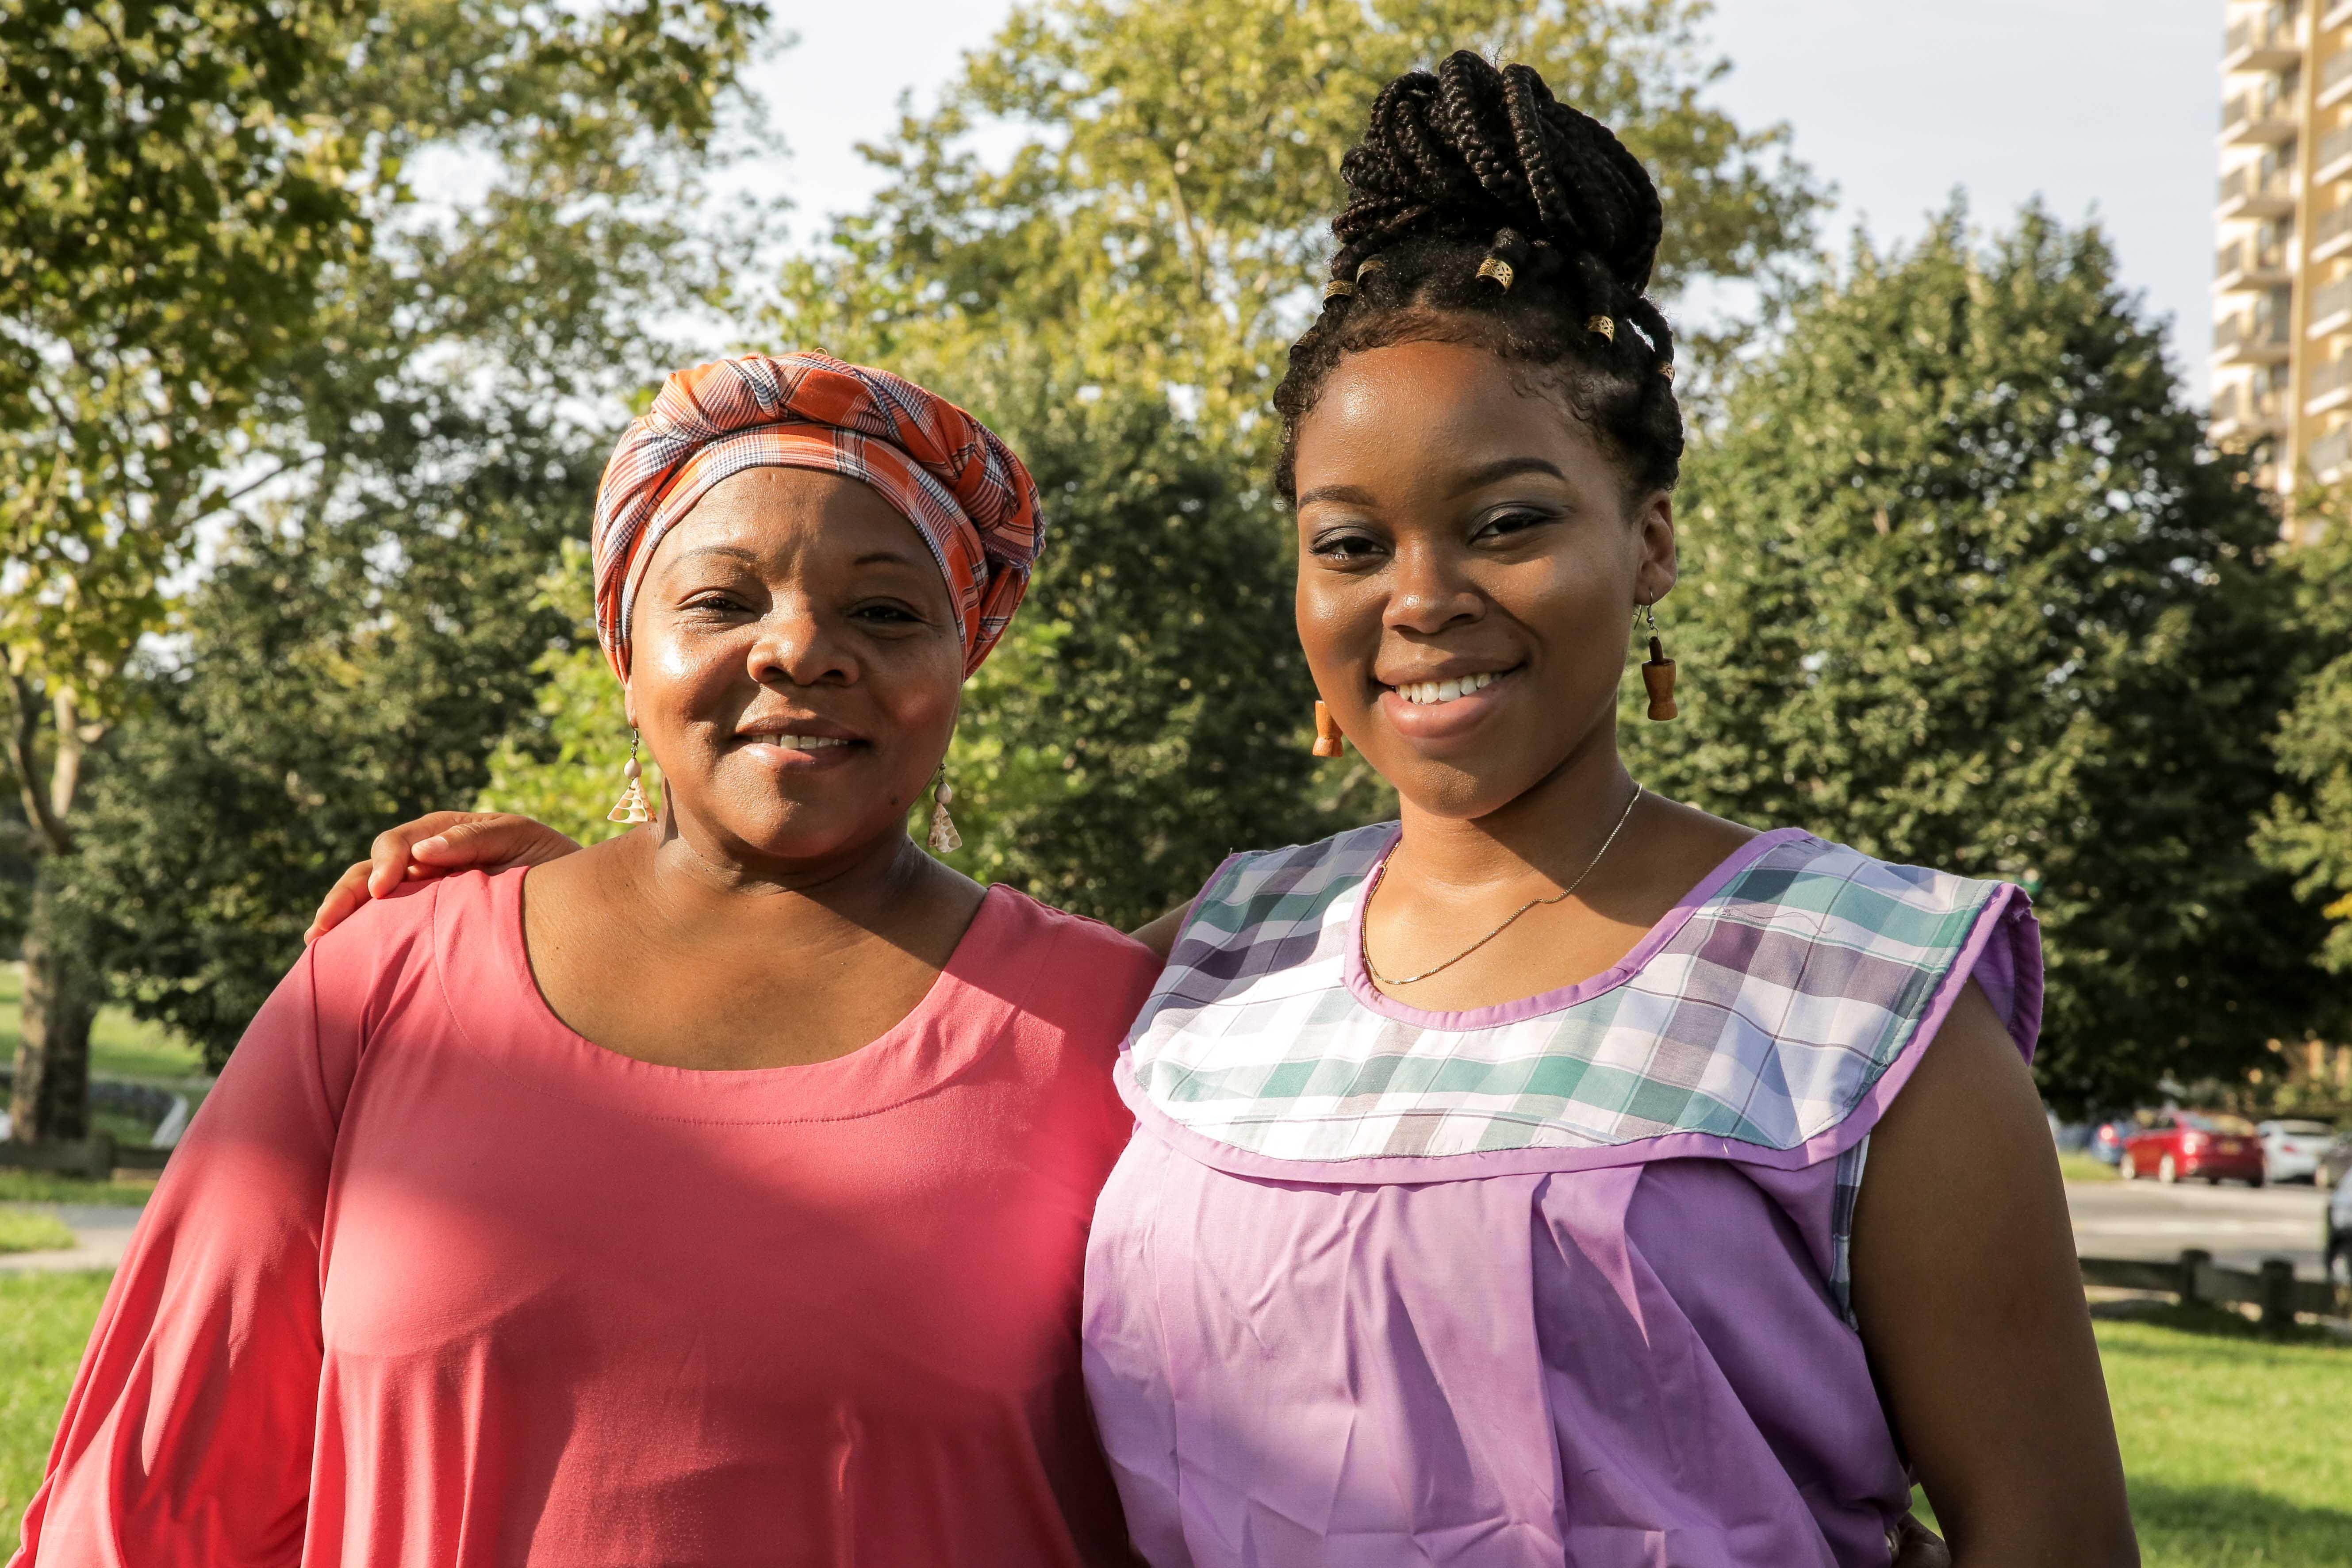 New York City's Garifuna Community Preserves Its Rich Culture Through Food